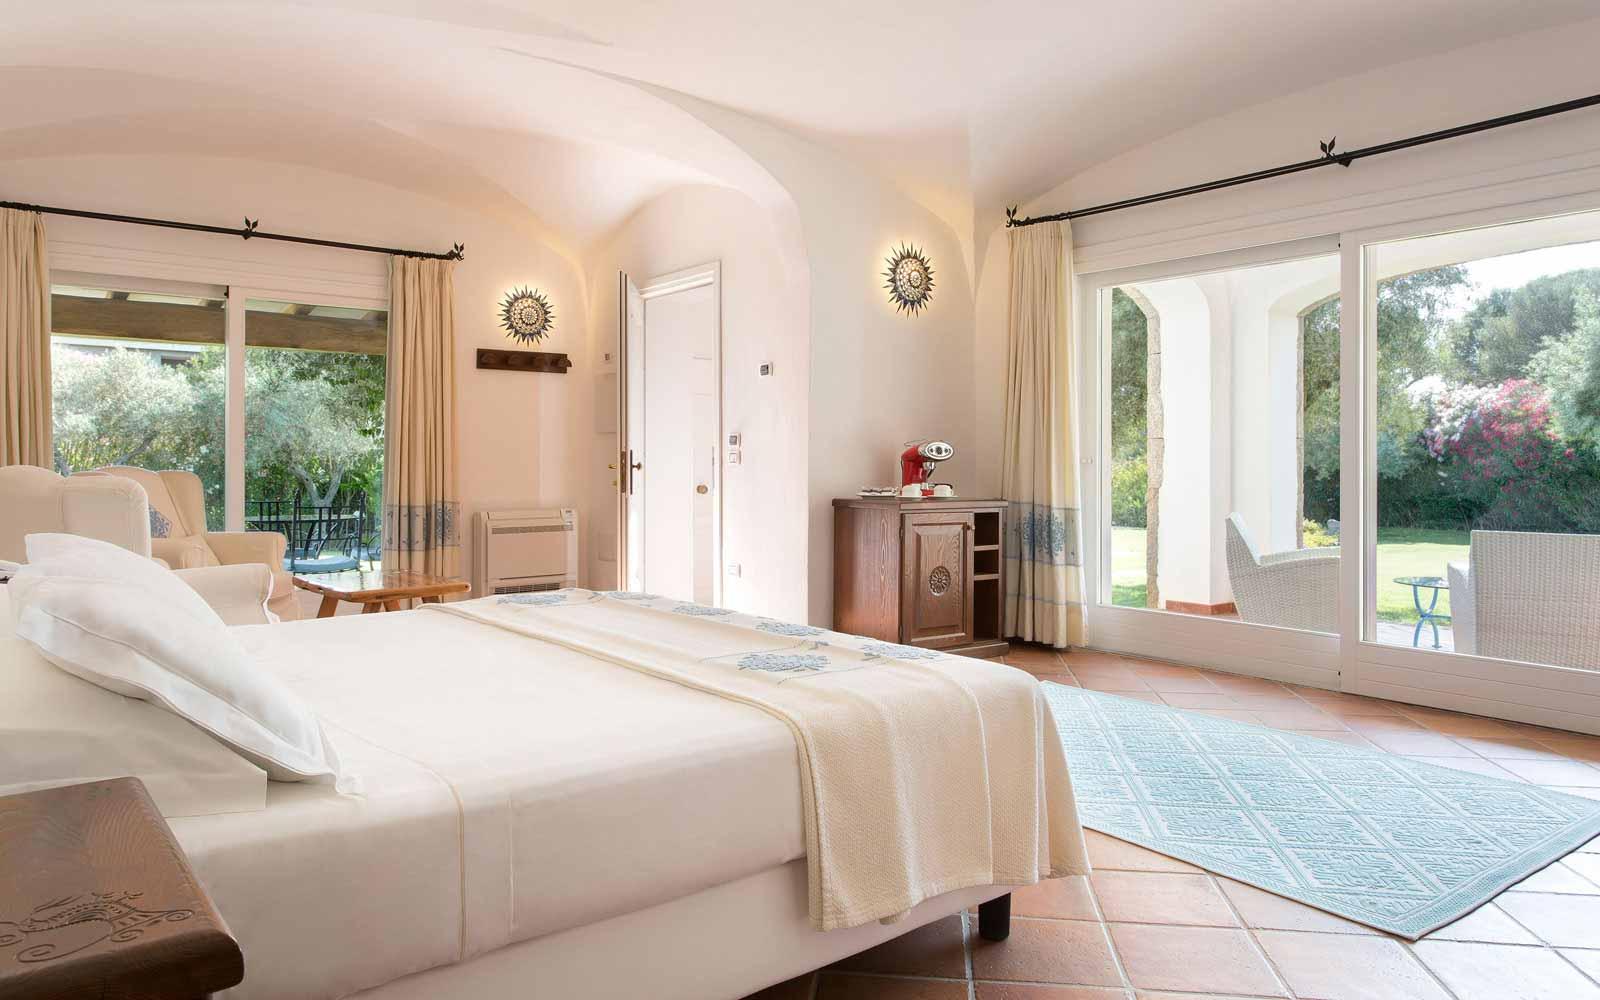 Junior Suite Deluxe at Hotel La Rocca Resort & Spa